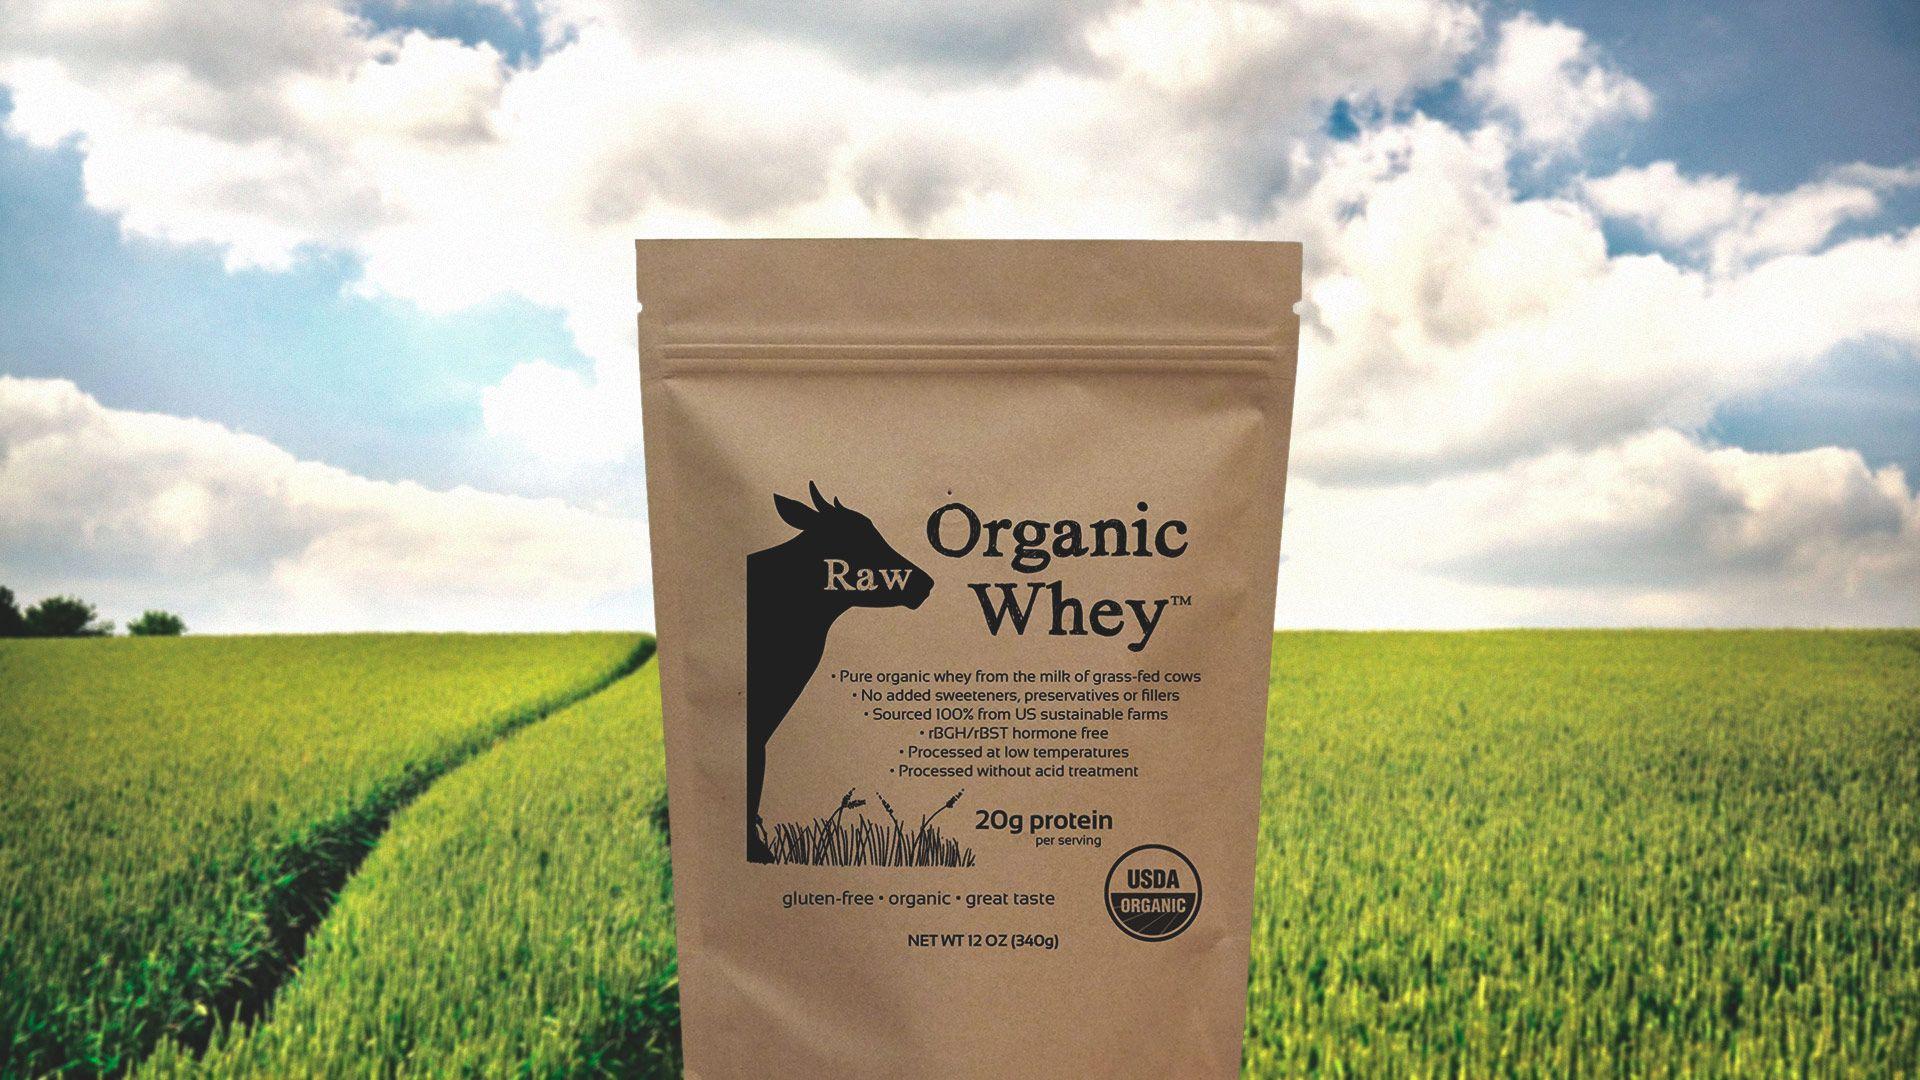 Organic Whey Protein Powder From Raw Organic Whey Organic Newsroom Organic Whey Protein Organic Whey Protein Powder Organic Protein Powder